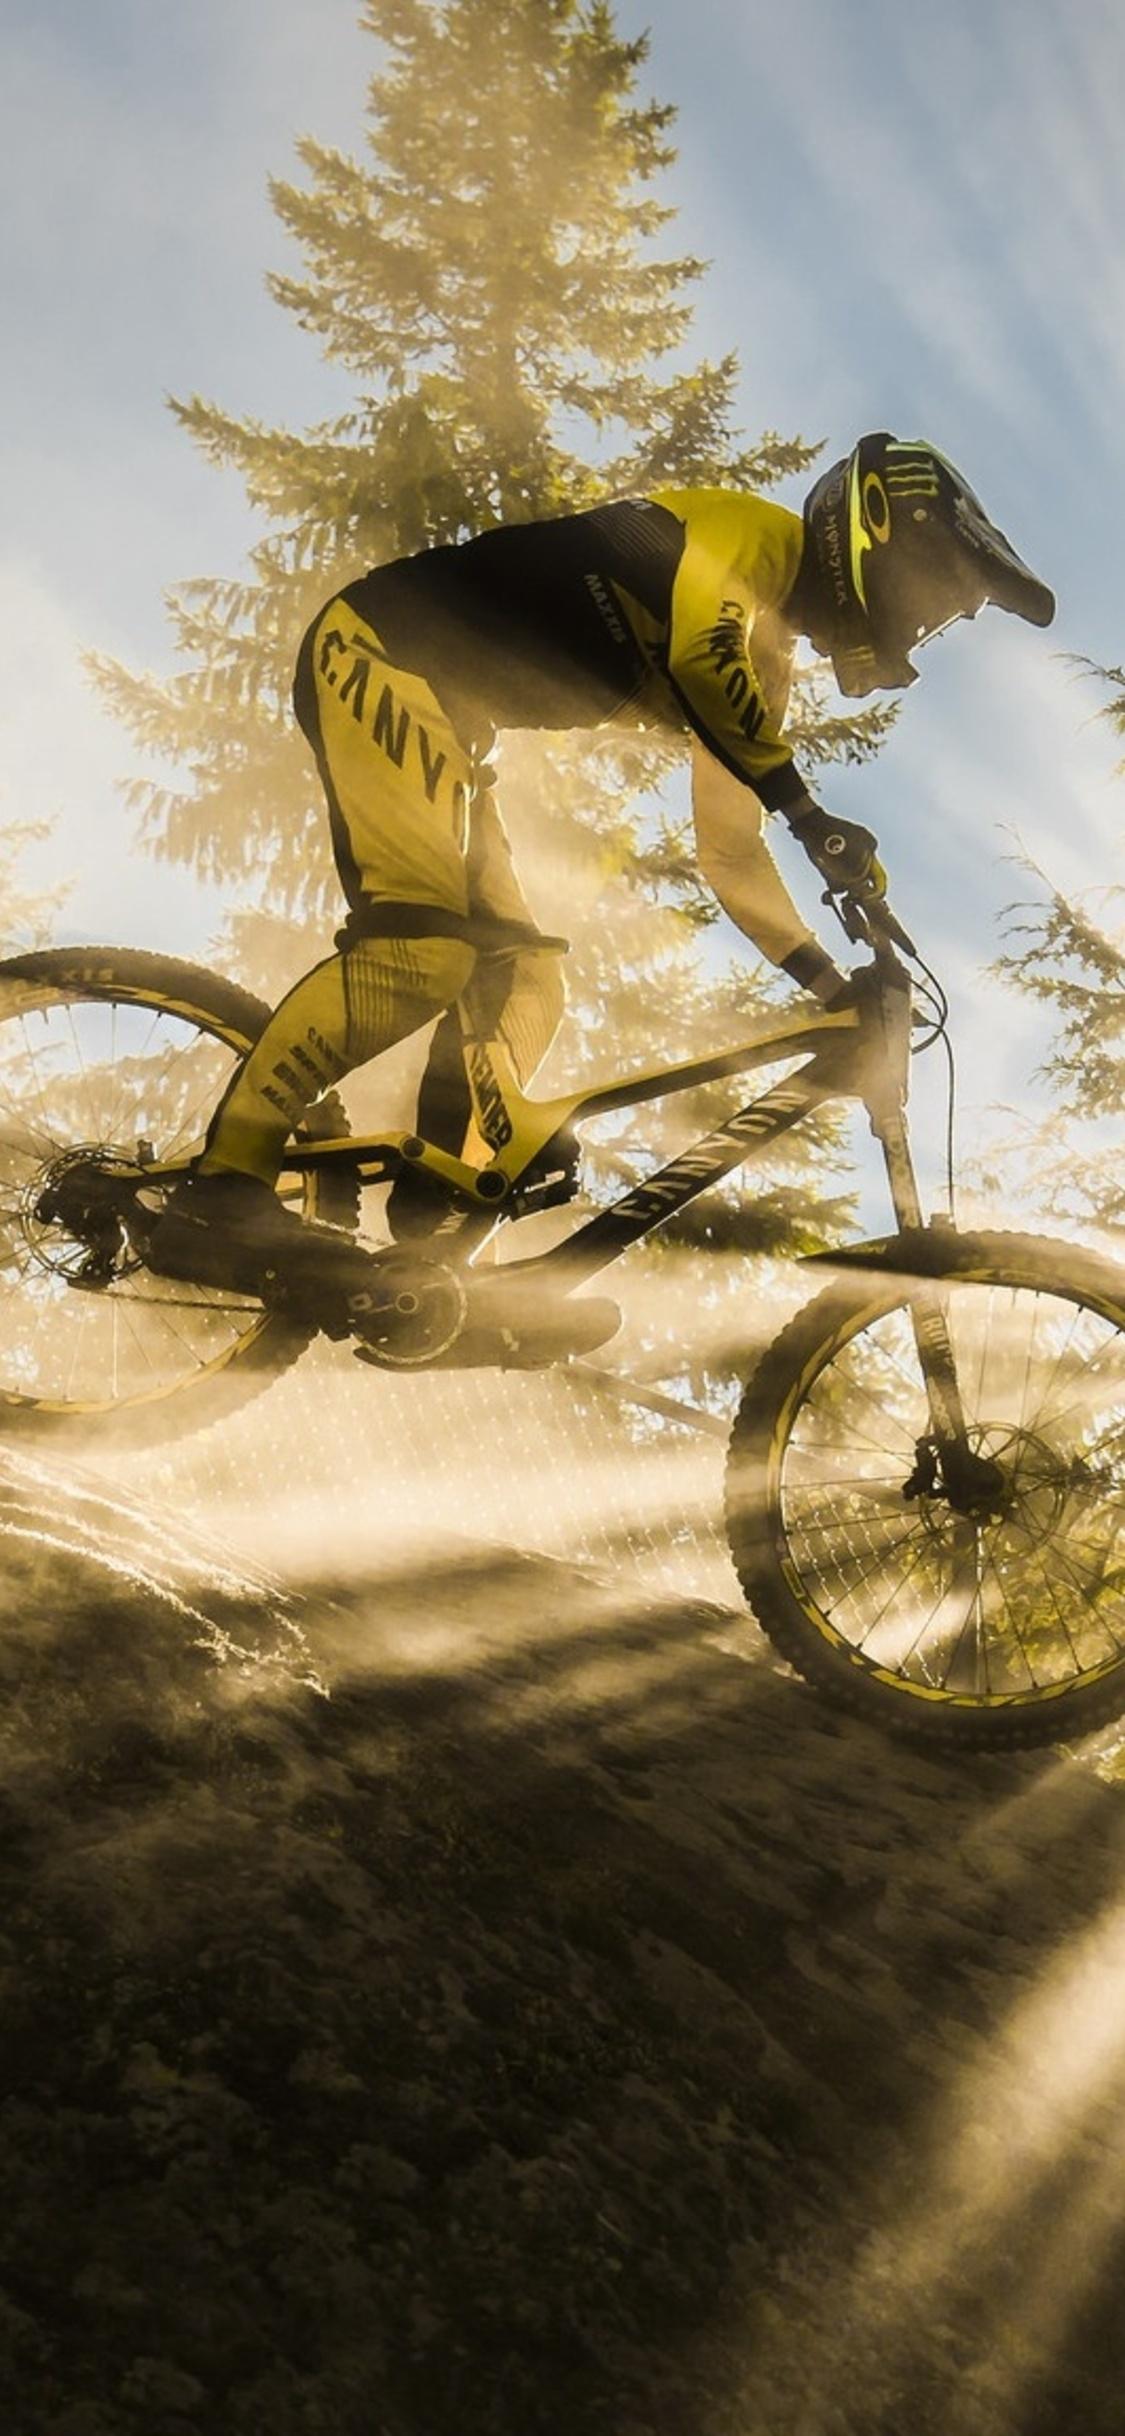 1125x2436 Mountain Bike Sunbeam Iphone Xs Iphone 10 Iphone X Hd 4k